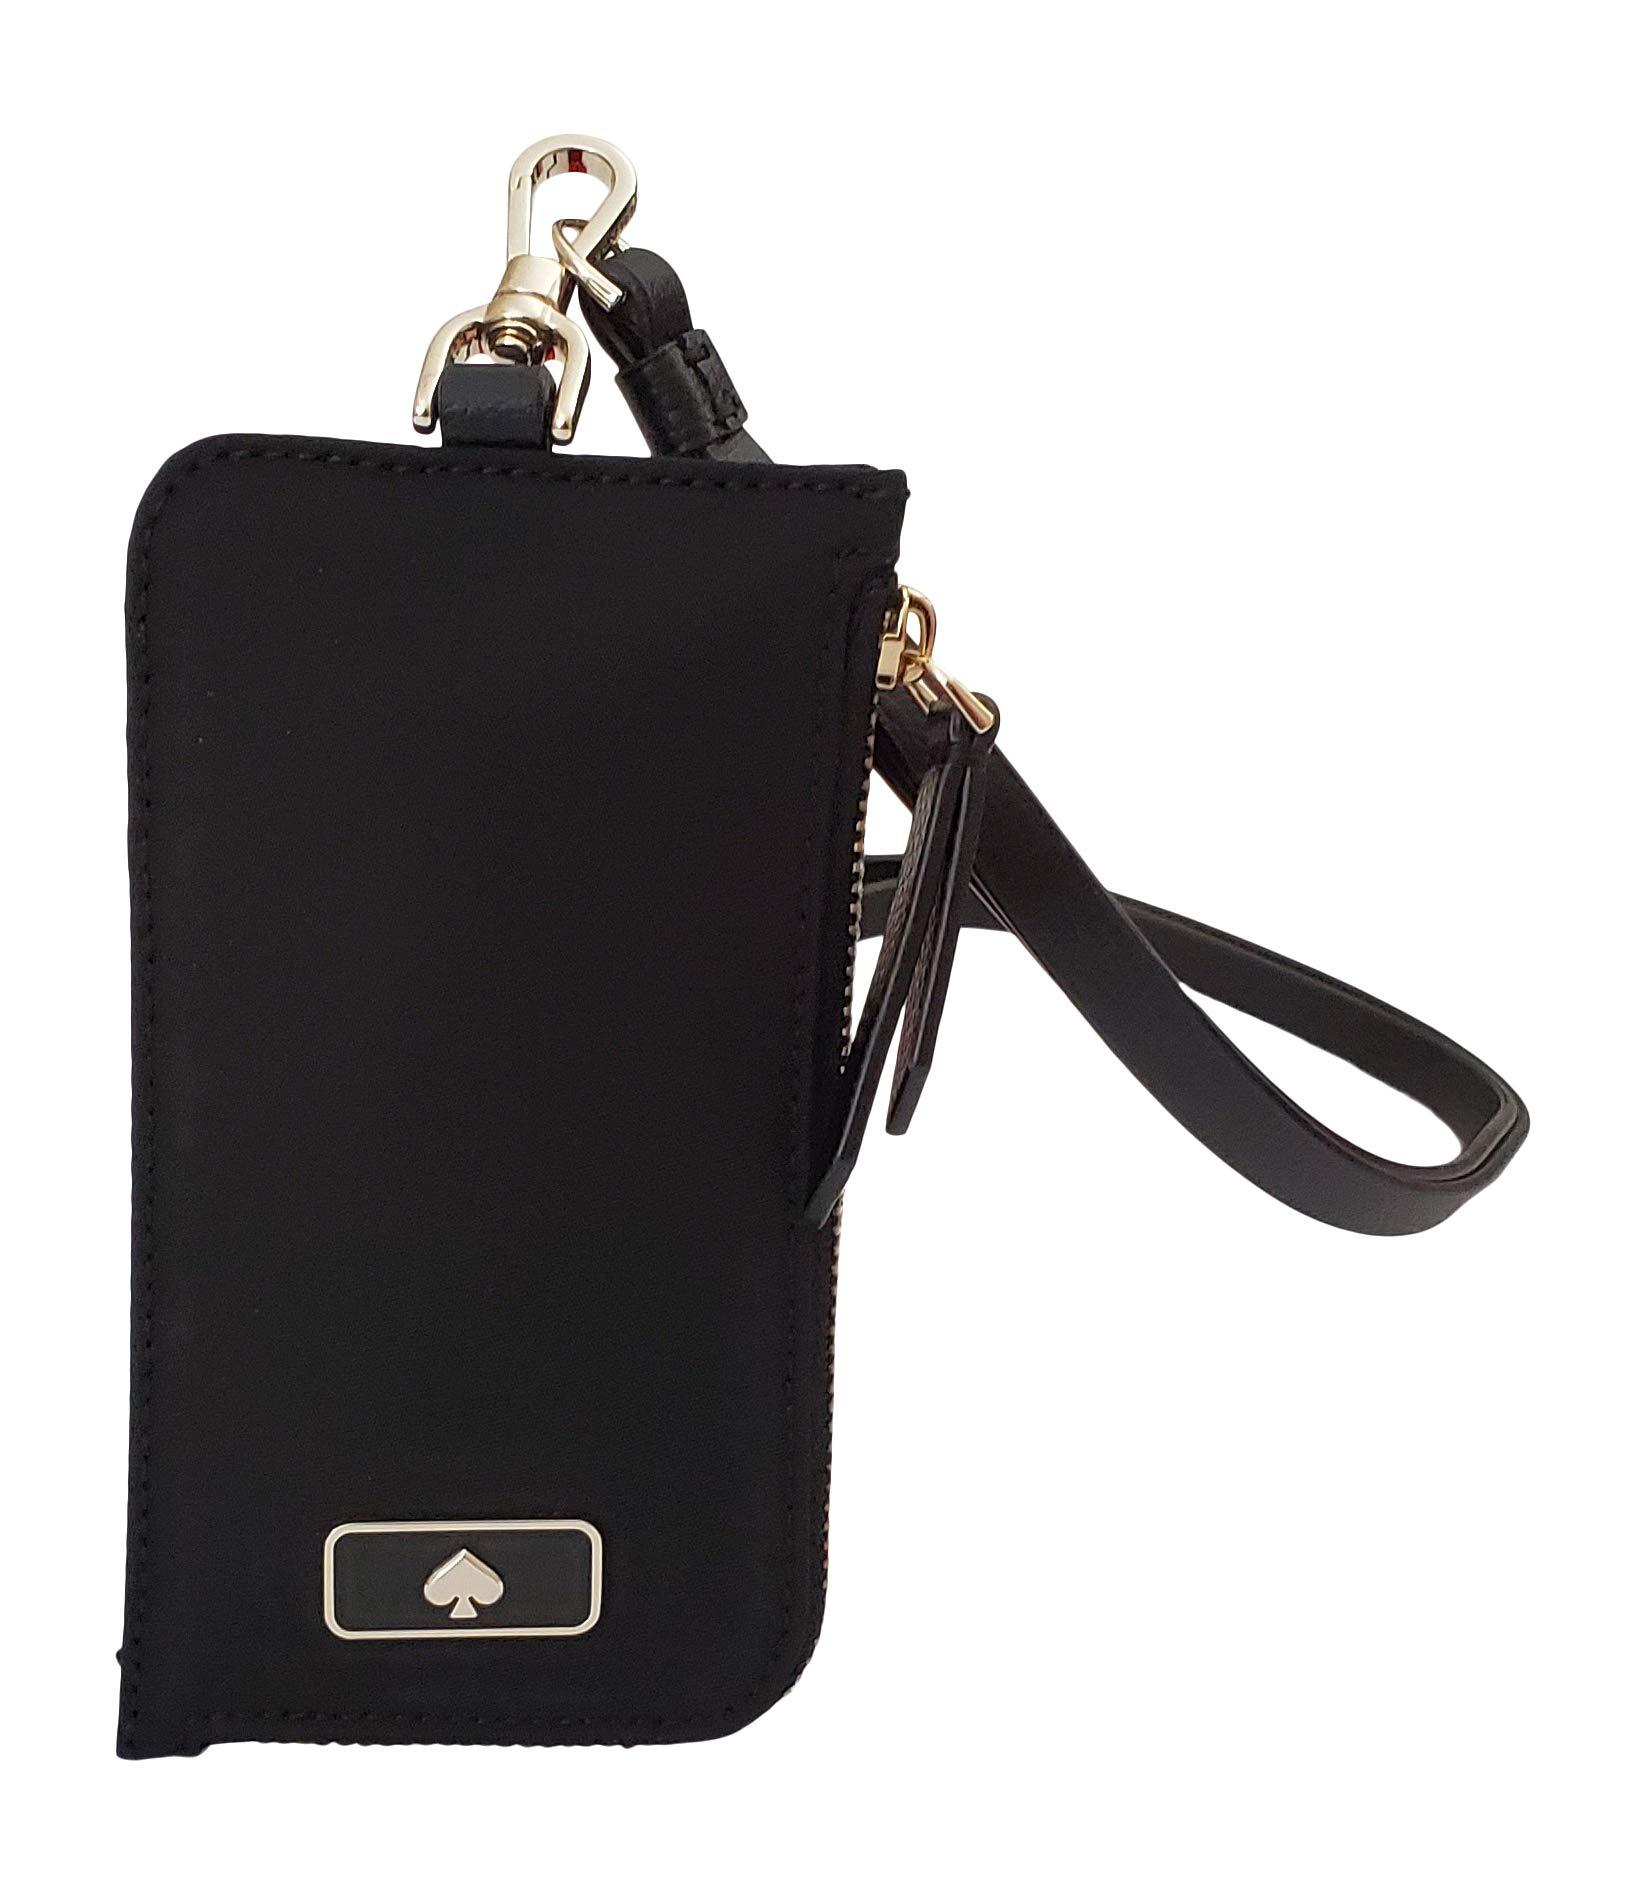 Kate Spade New York L-Zip Dawn Card Case Lanyard Black by Kate Spade New York